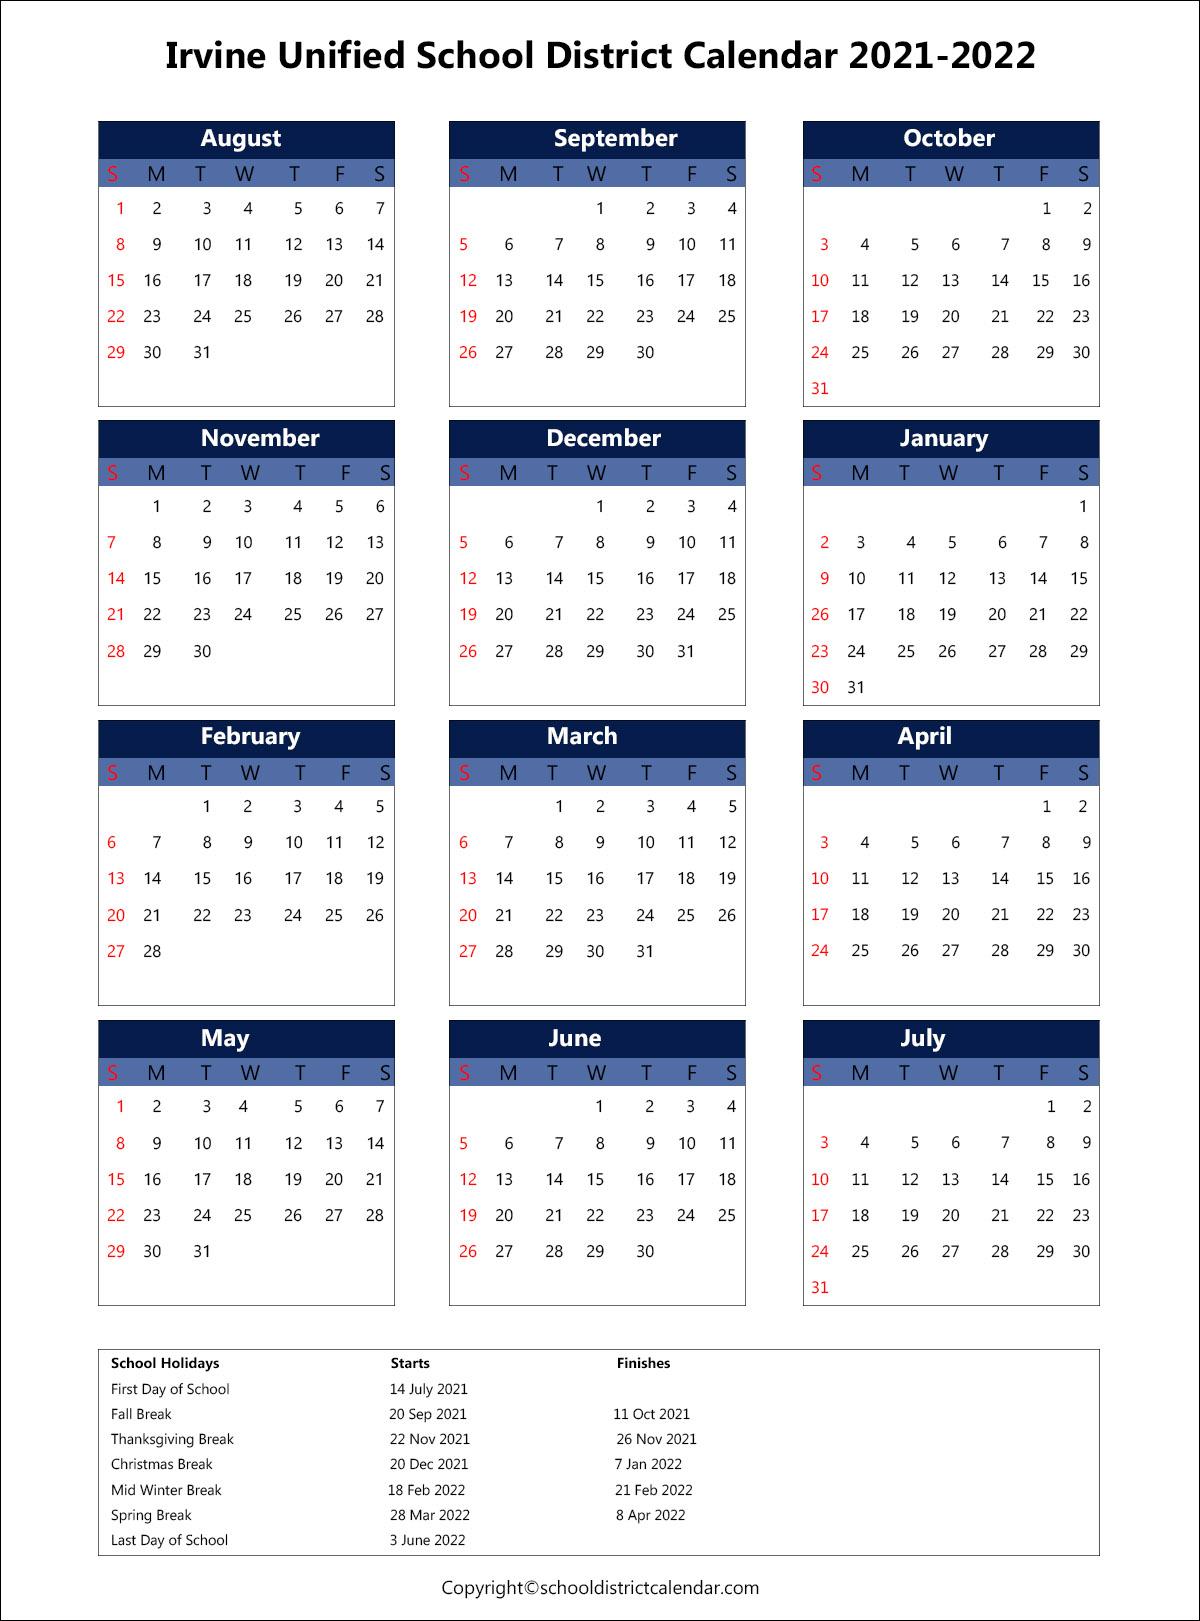 Iusd Calendar 2022.Irvine Unified School District Calendar Holidays 2021 2022